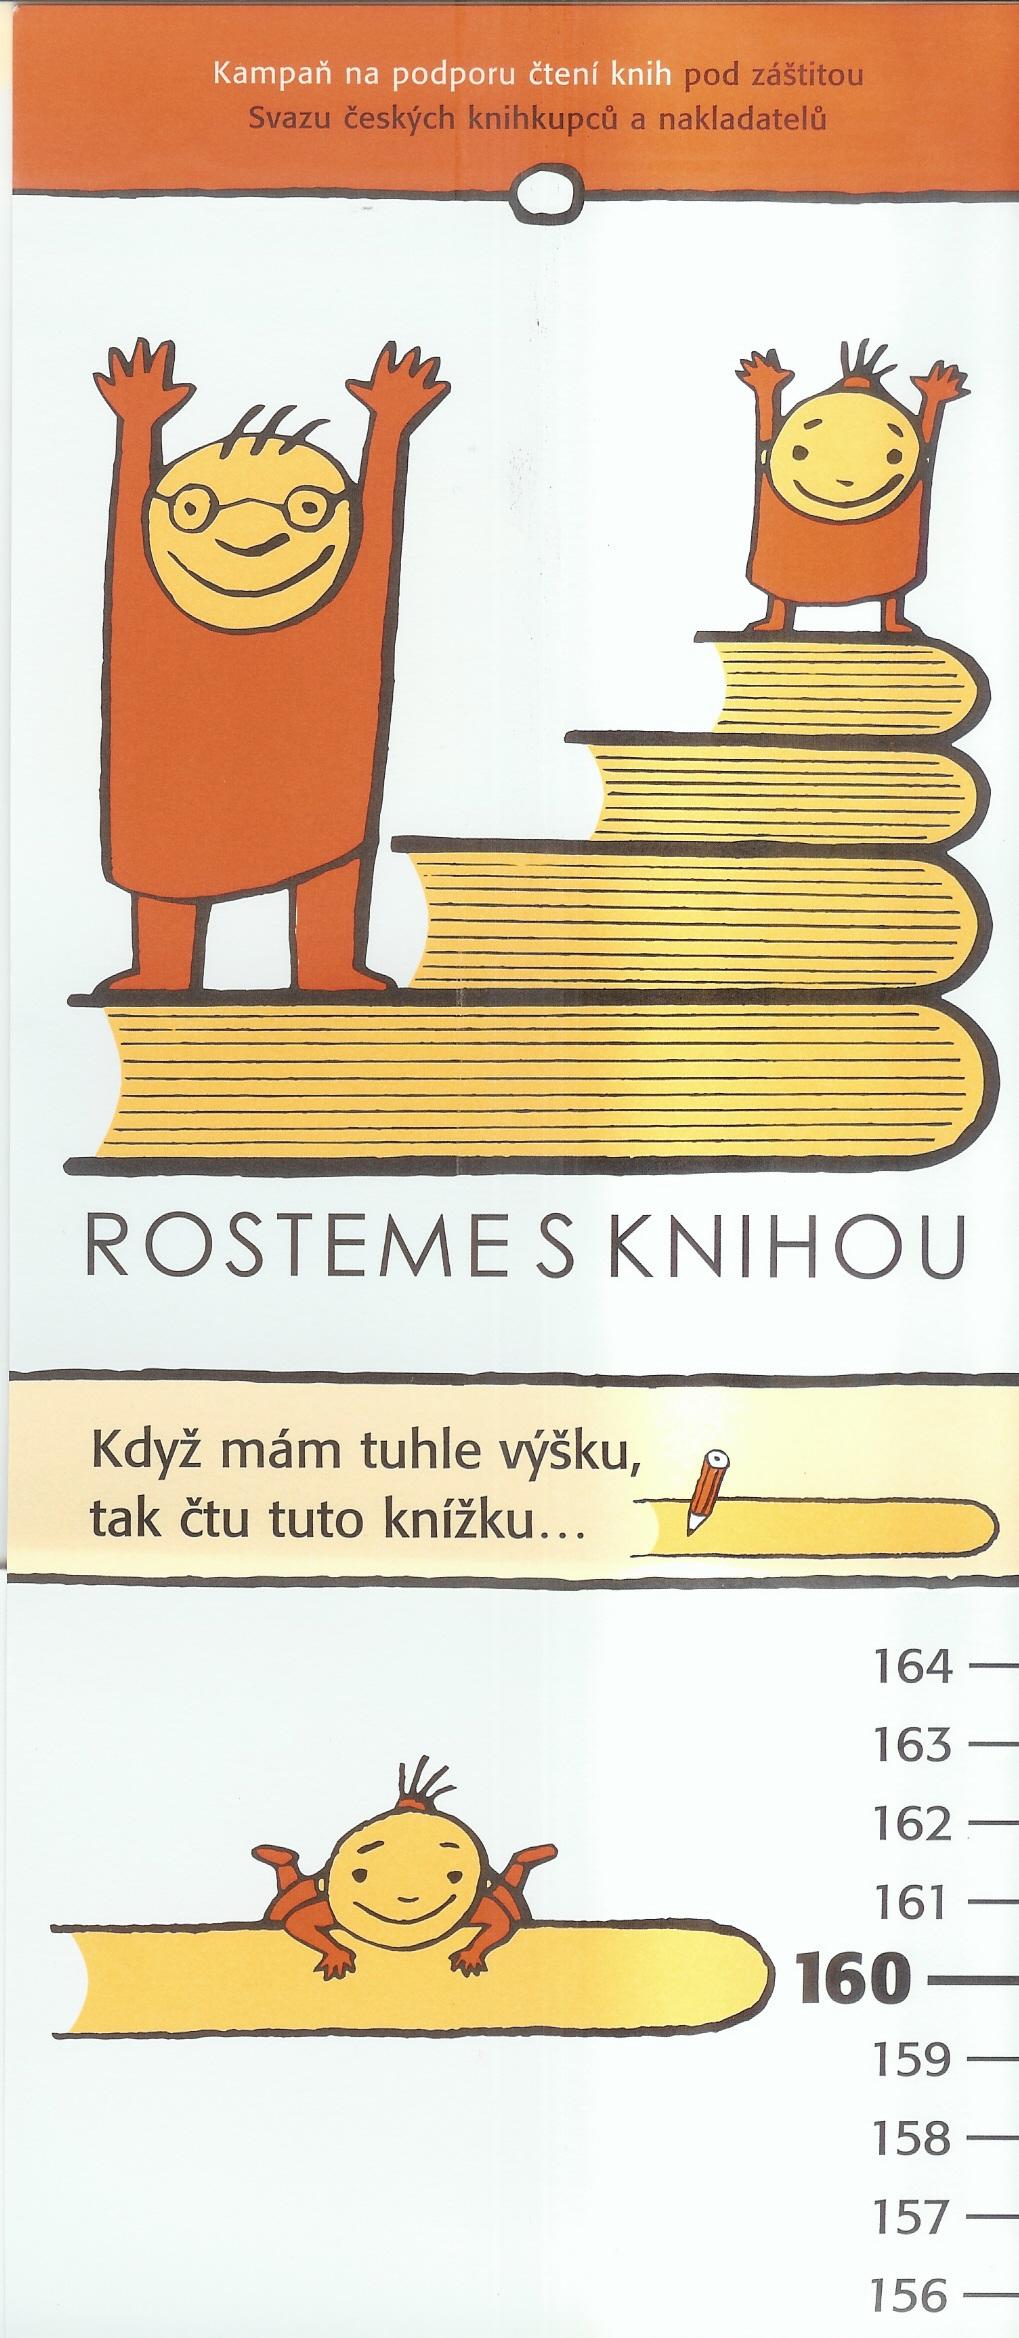 Metr_Rosteme_s_knihou